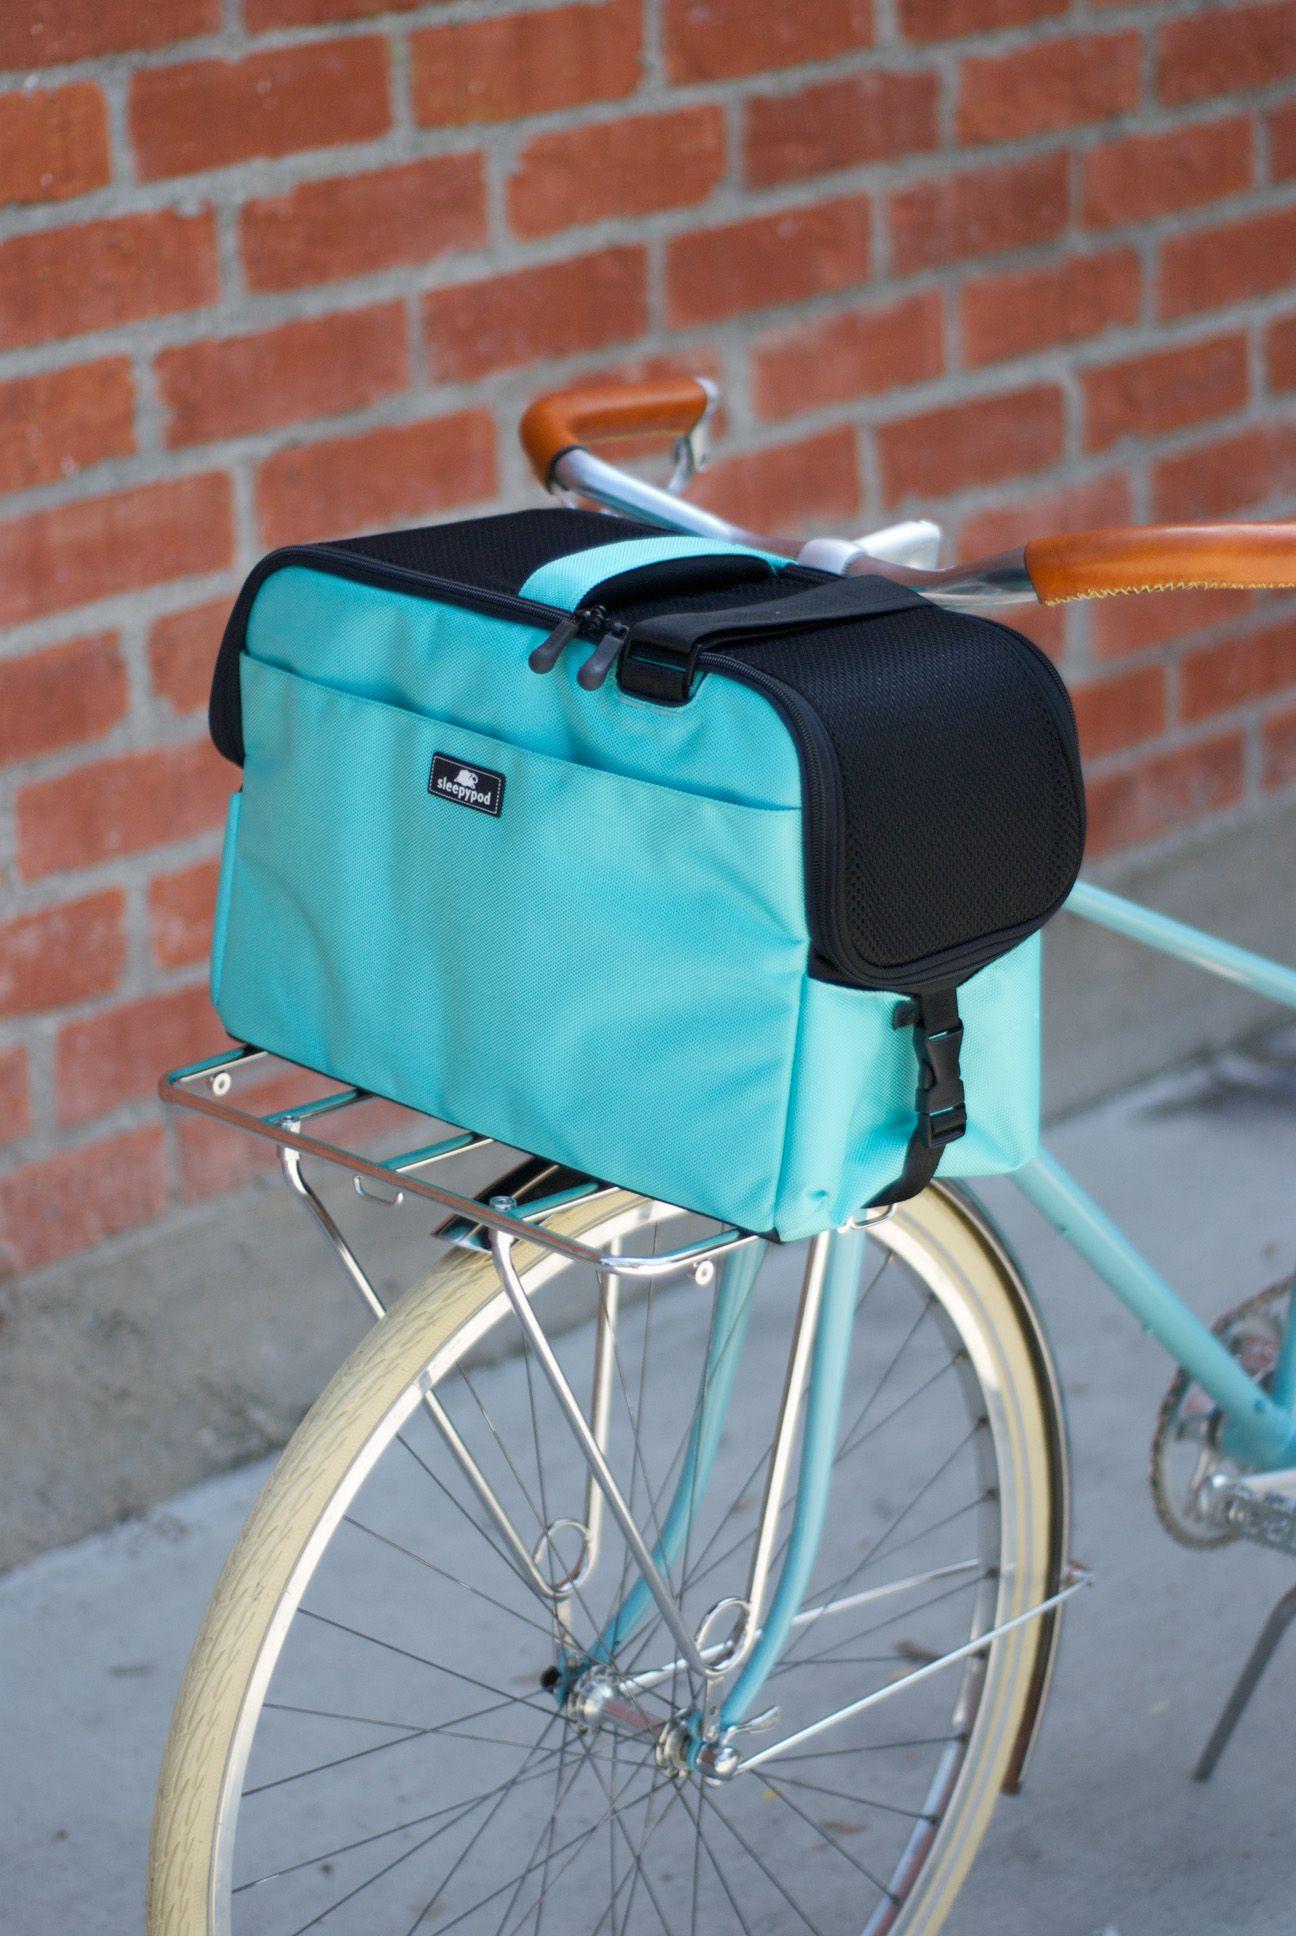 Sleepypod Sleepypod® Pet carriers, Biking with dog